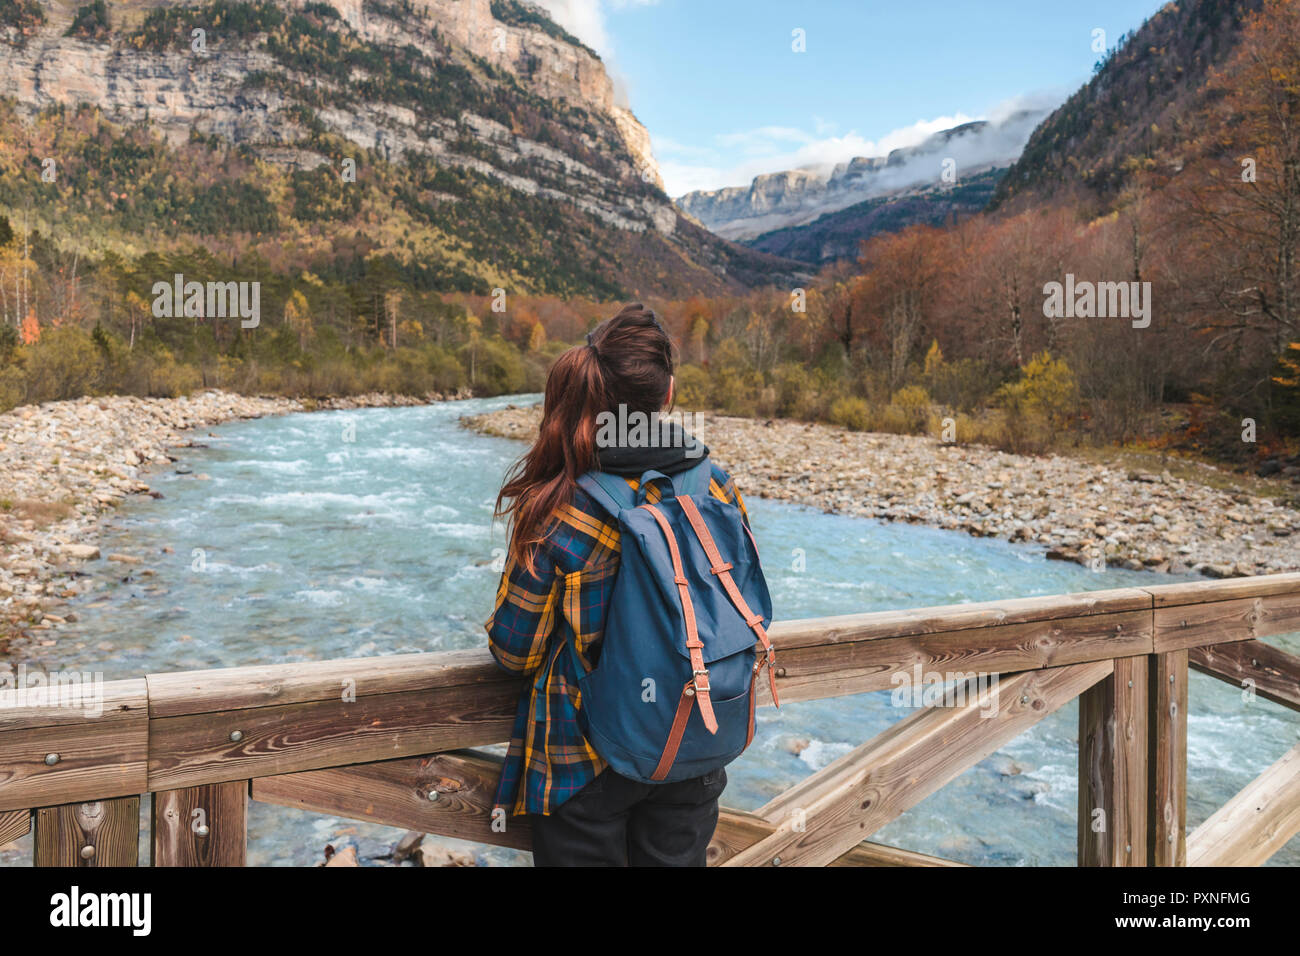 Spain, Ordesa y Monte Perdido National Park, back view of woman with backpack on wood bridge - Stock Image